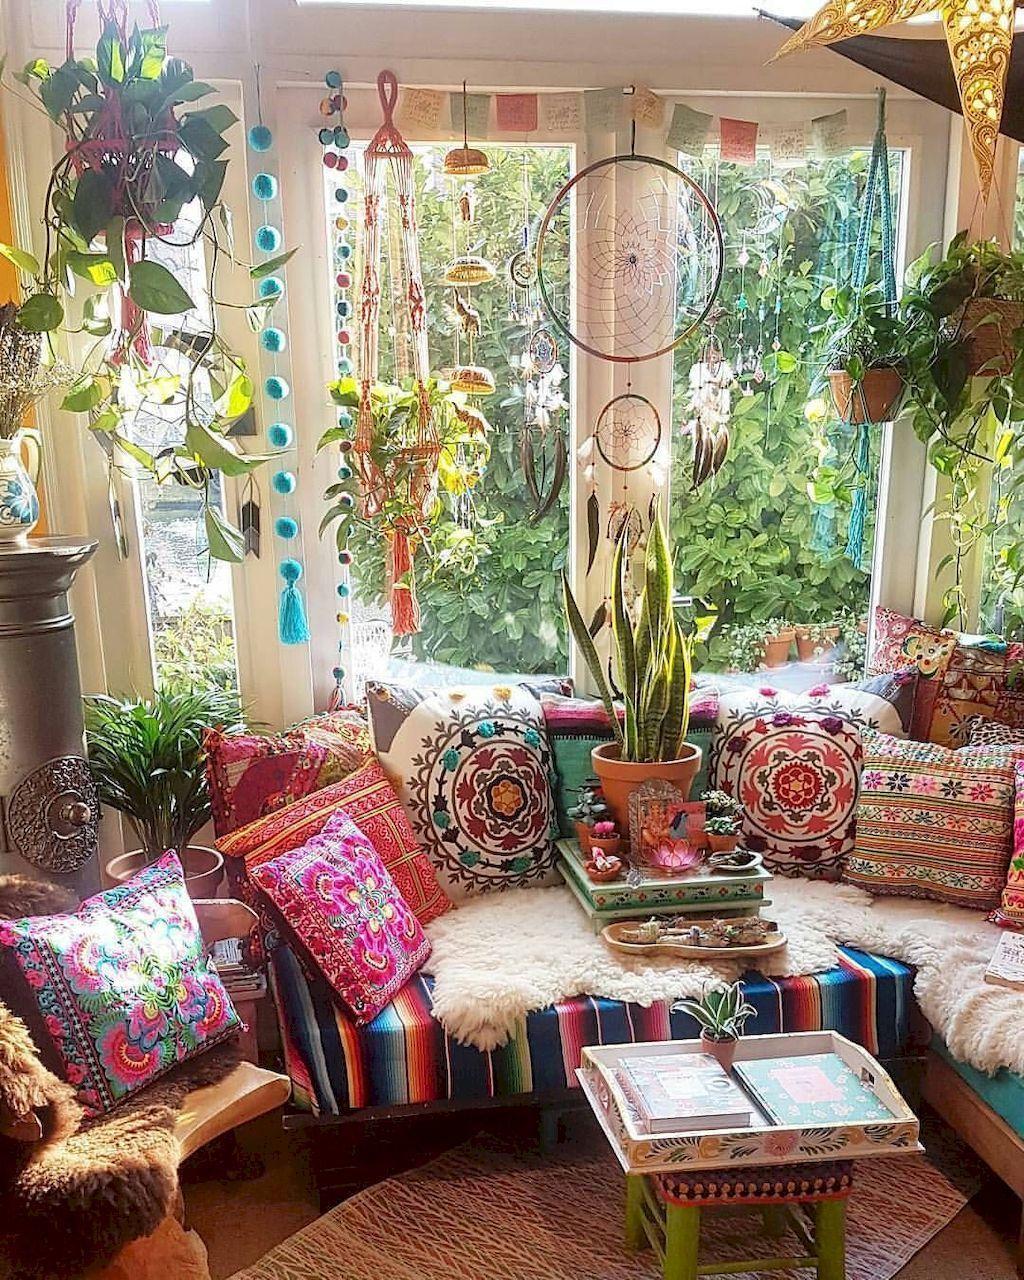 33+ Beautiful Bohemian Bedroom Decor to Inspire You | home ...